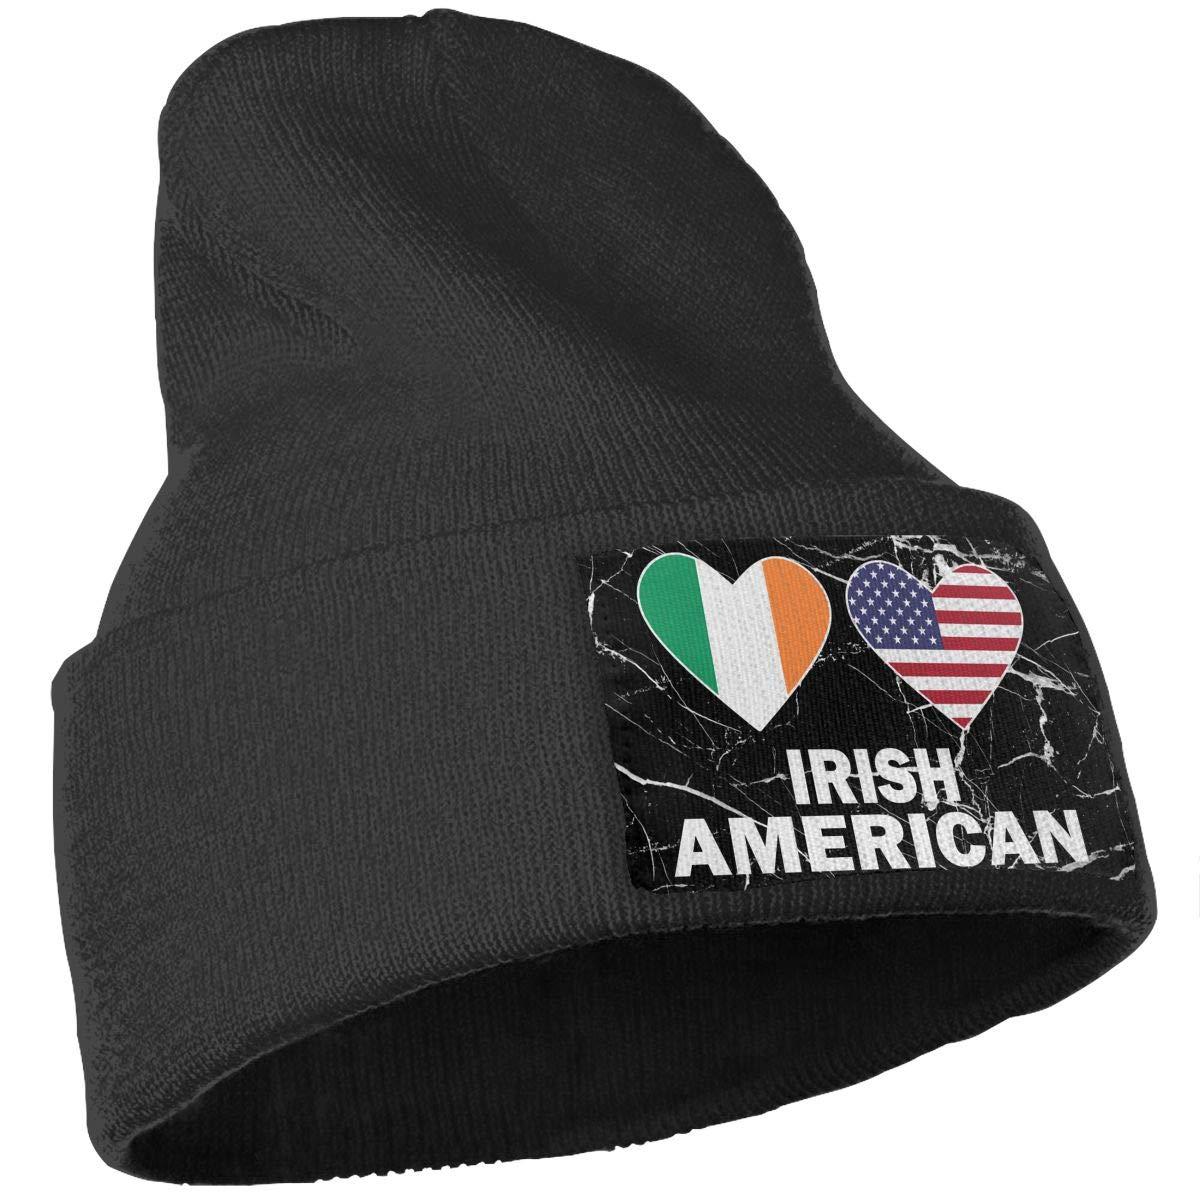 Irish American Hearts Beanie Cap Hat Men /& Women Knit Hats Stretchy /& Soft Beanie